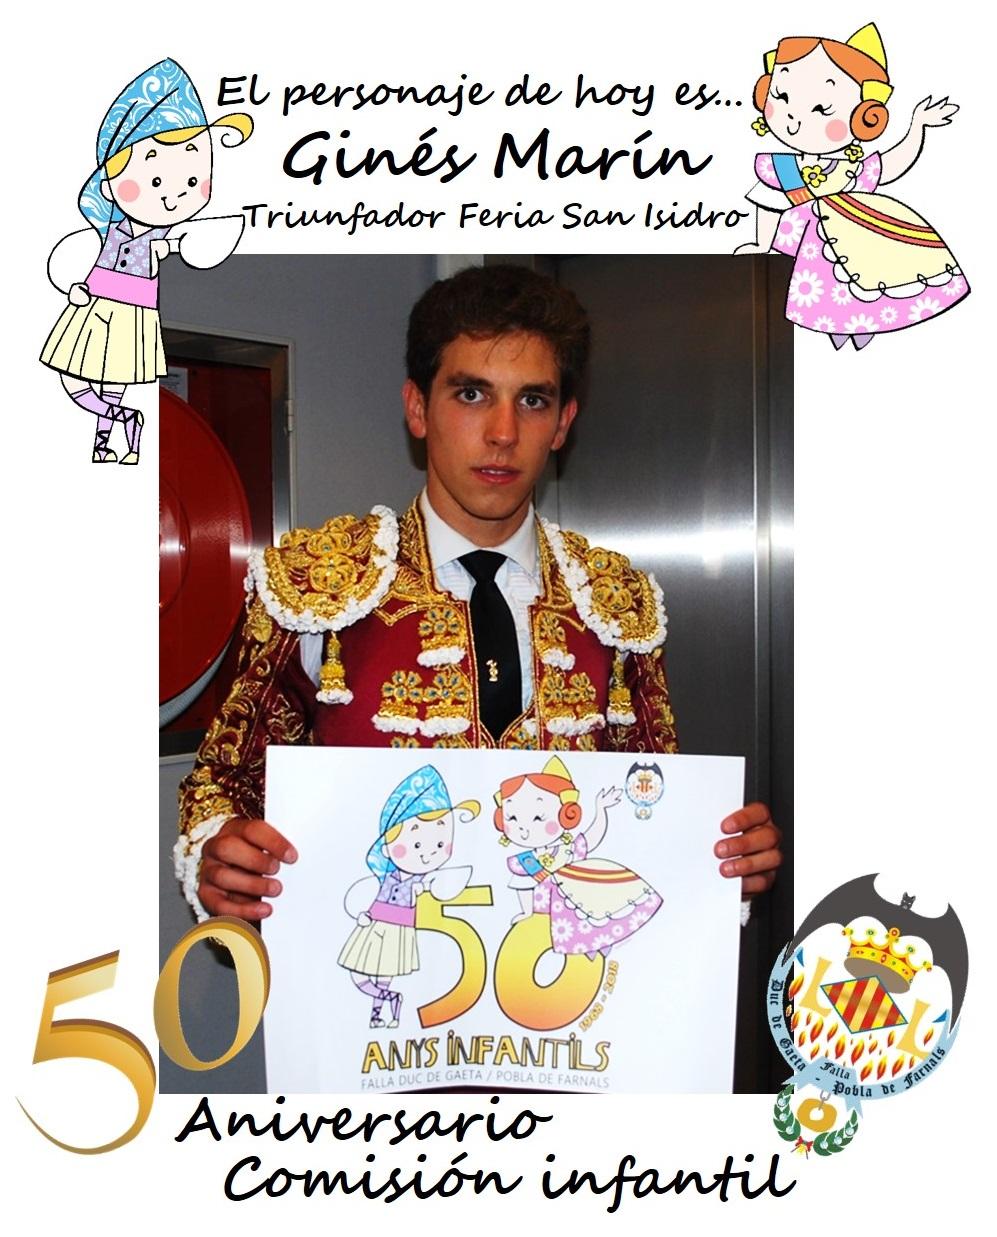 Personaje del día: Ginés Marín, torero